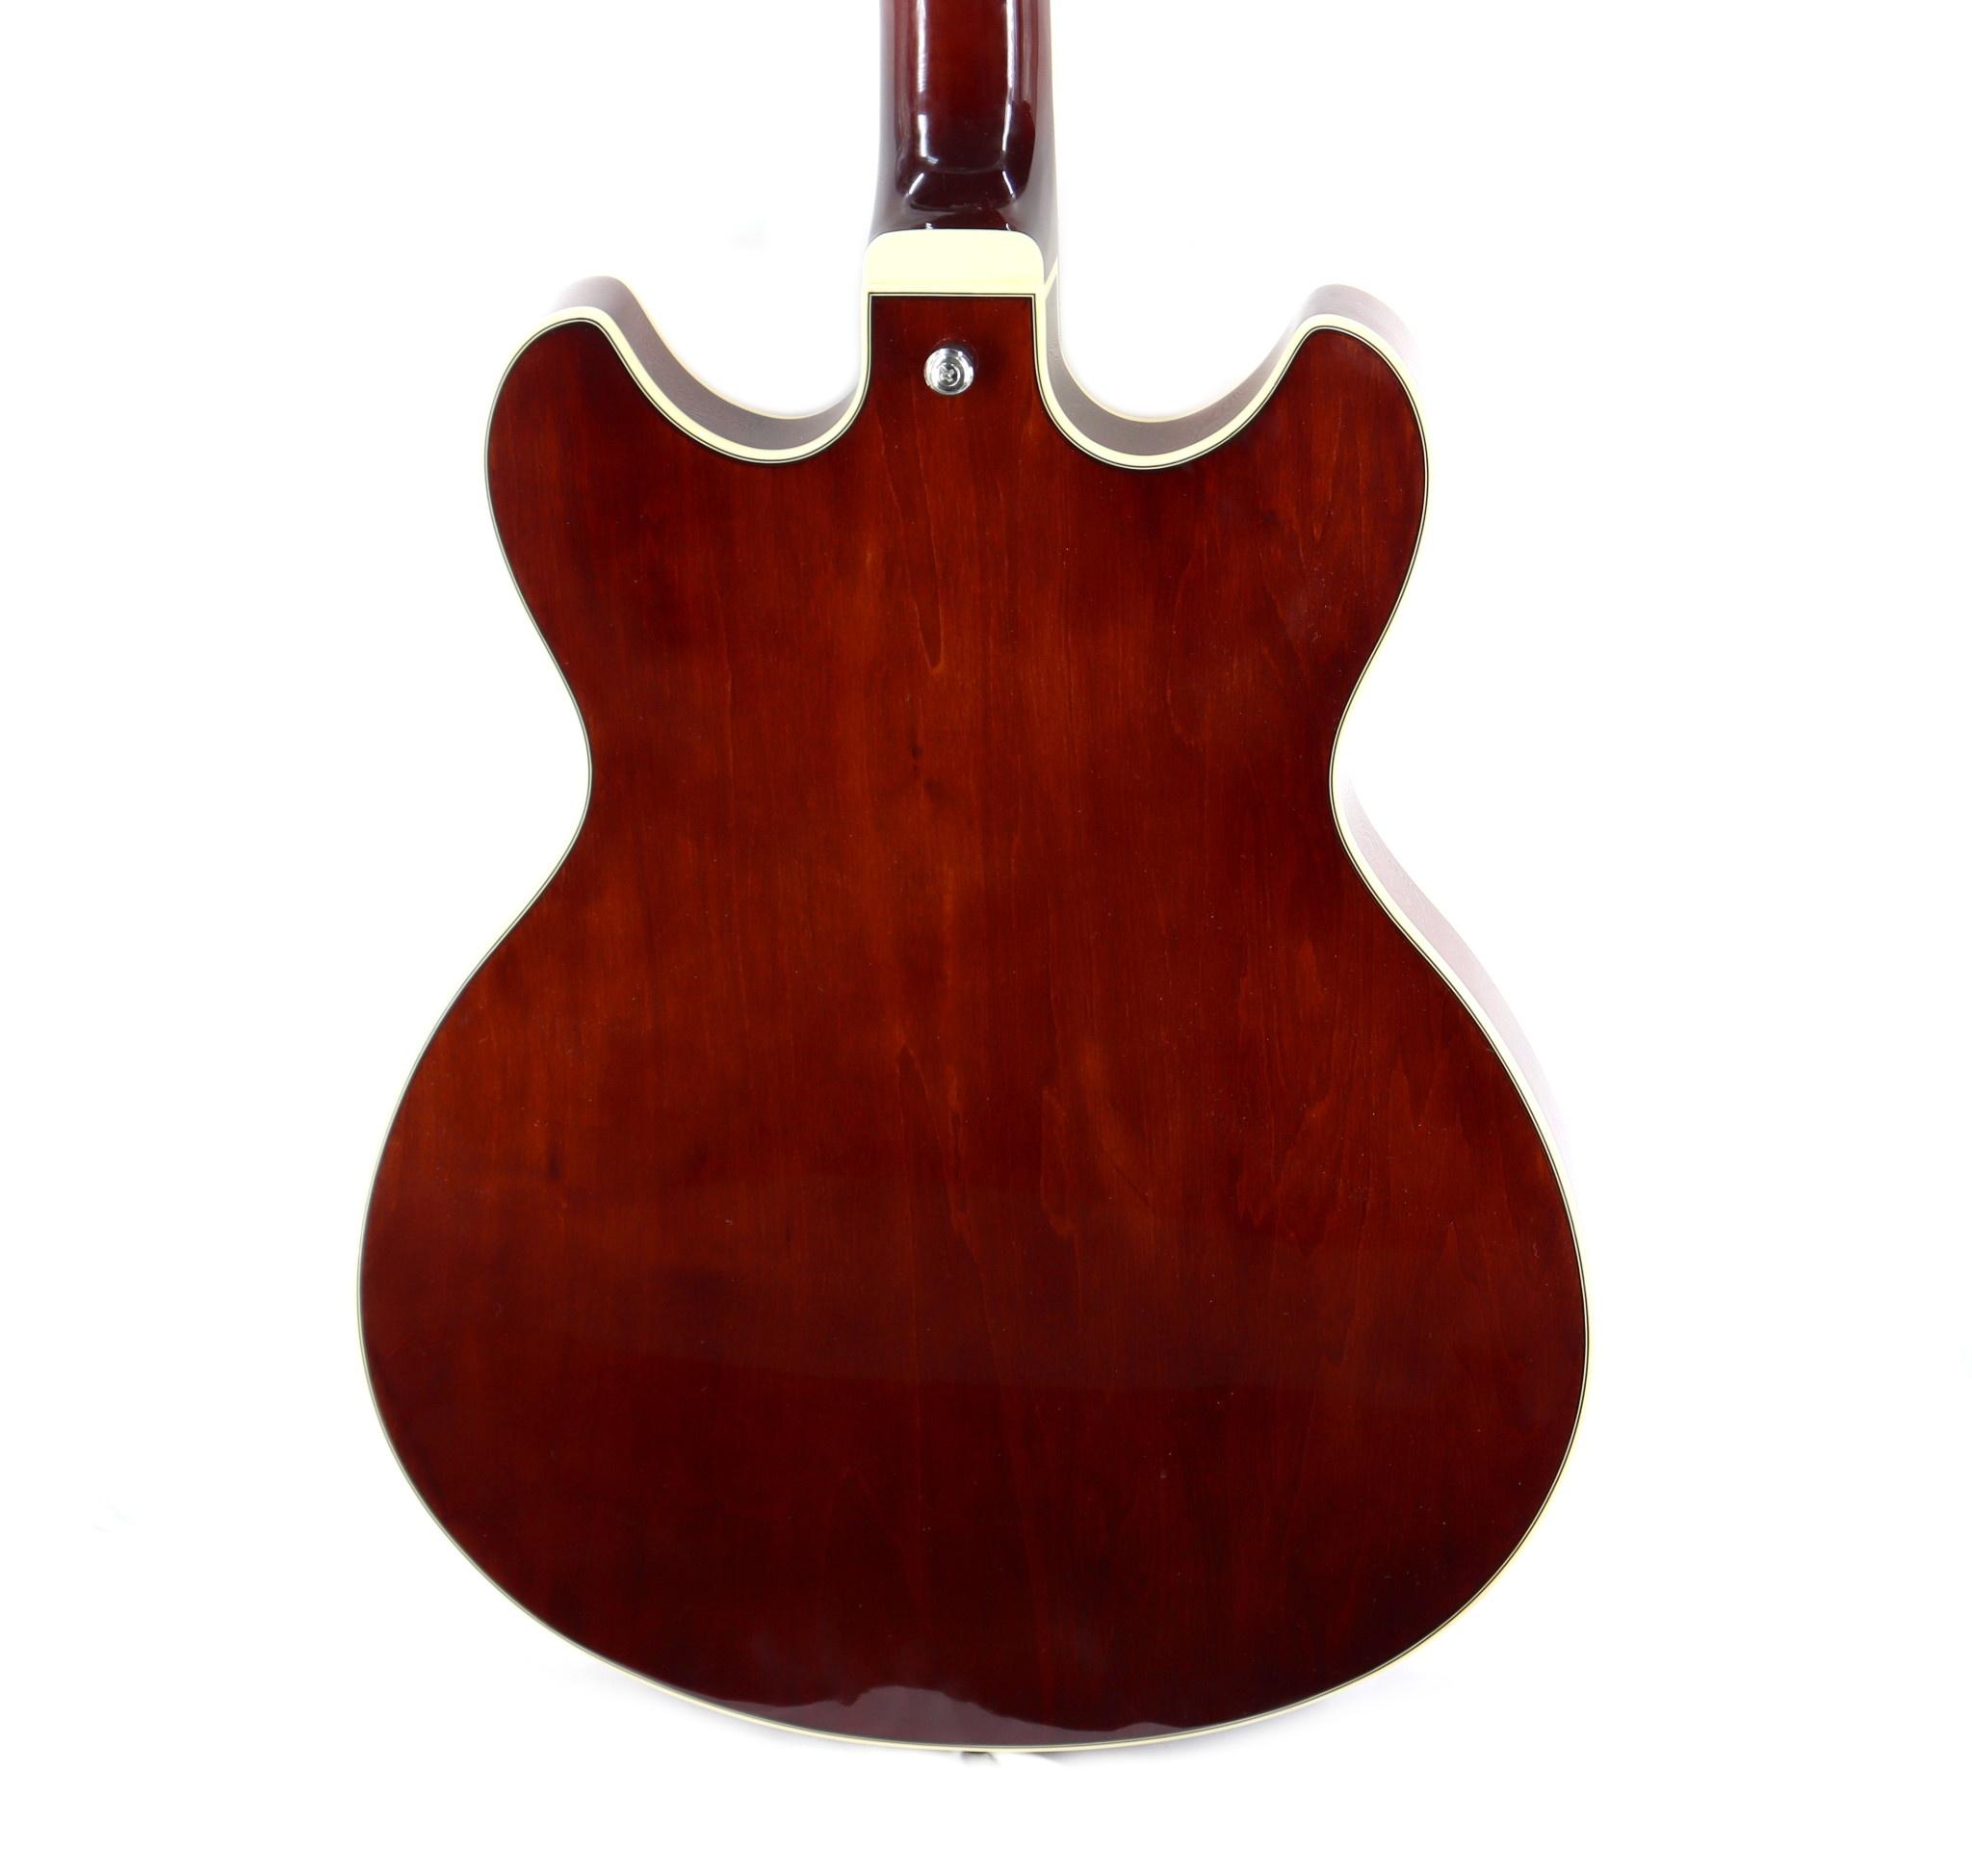 Ibanez Ibanez AS Artcore 6str Hollow Body Electric Guitar - Transparent Autumn Fade